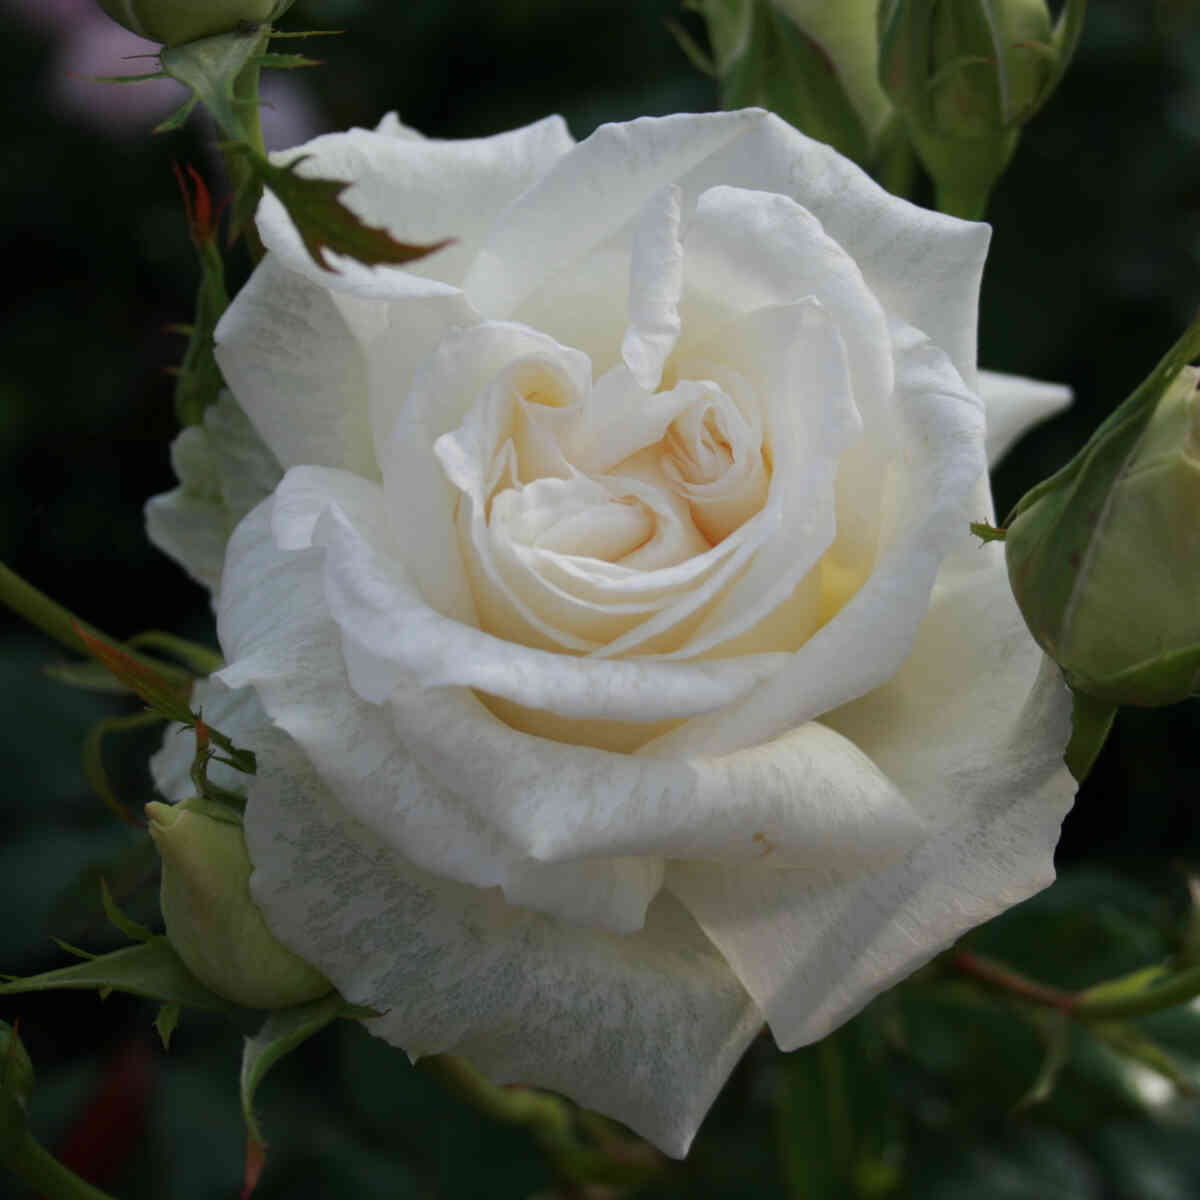 Rose 'Karen Blixen'